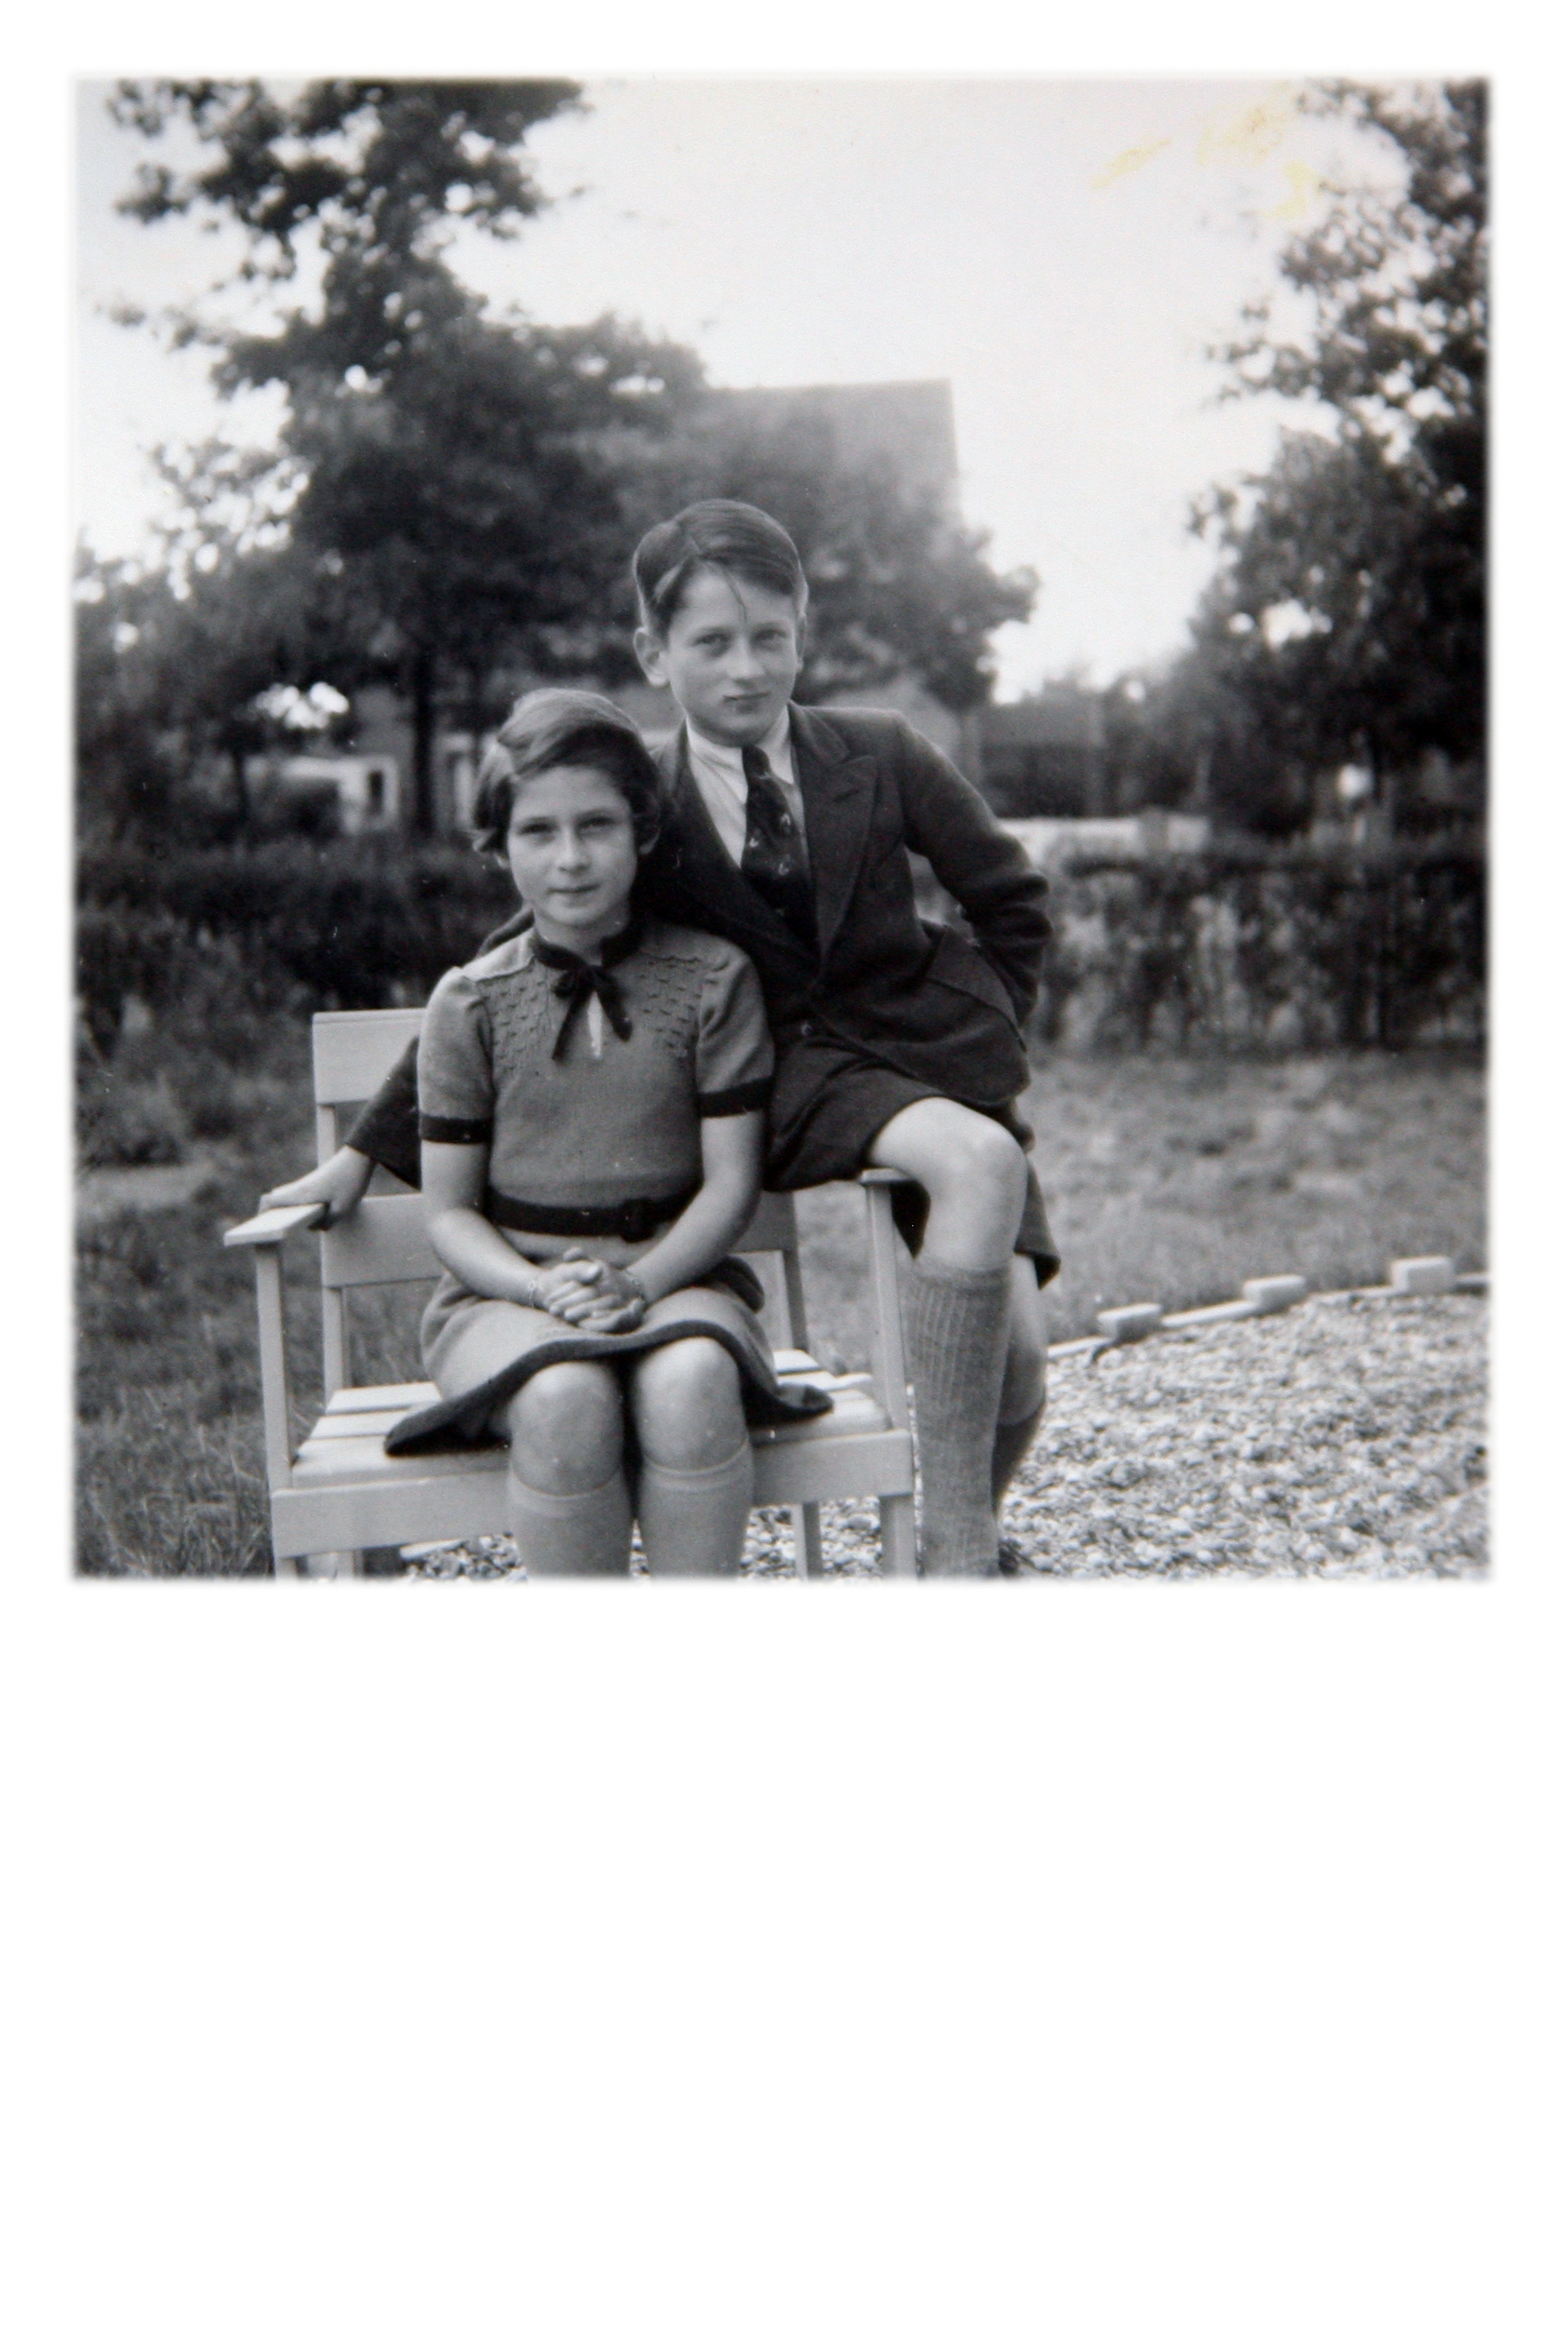 Irene and Werner, circa 1942.